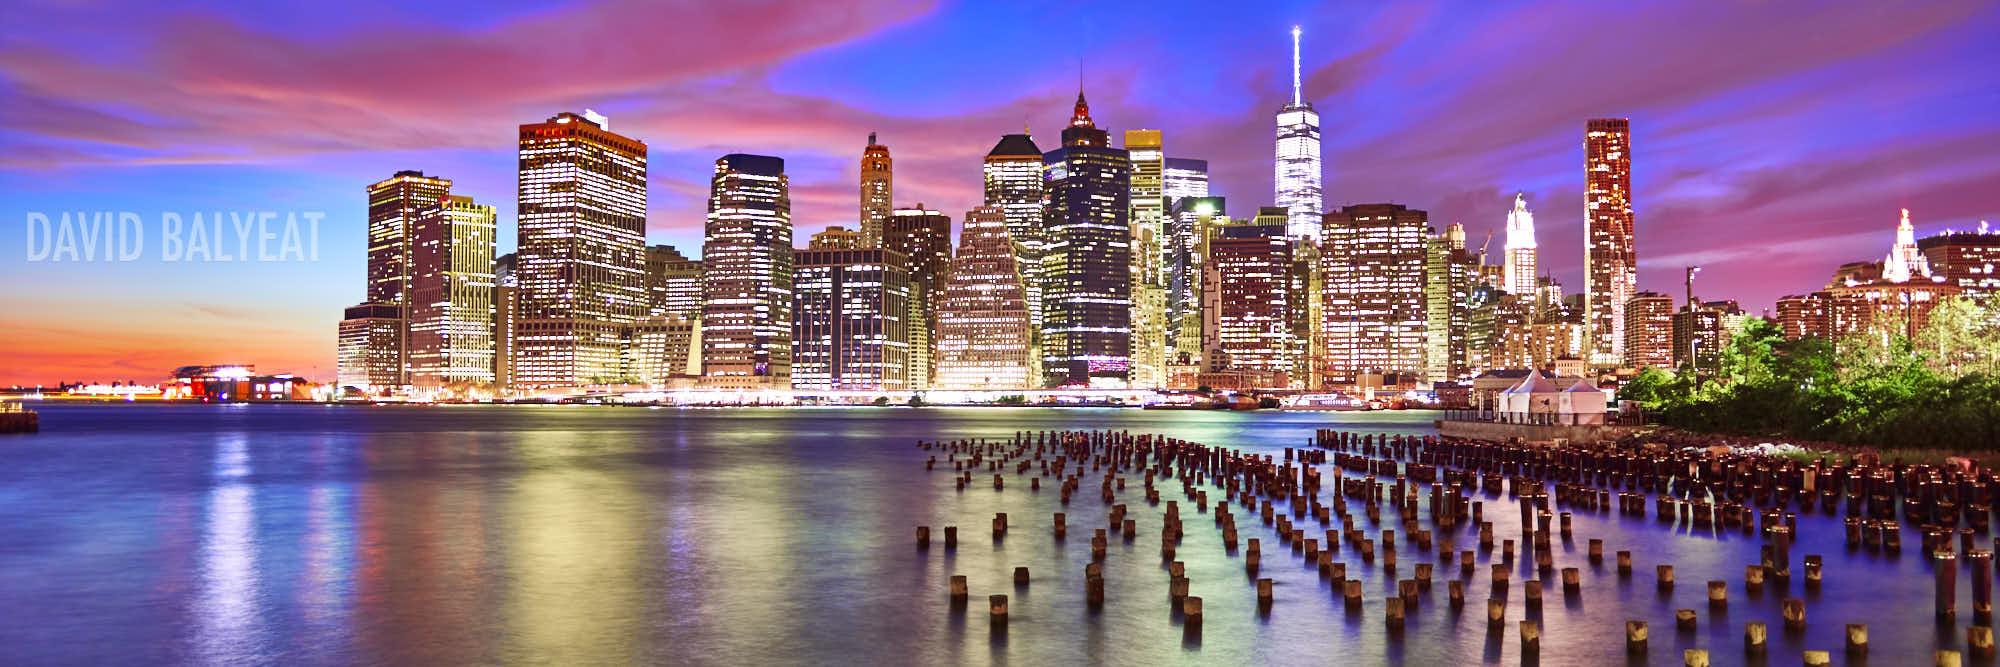 Lower Manhattan New York David Balyeat Photography Portfolio